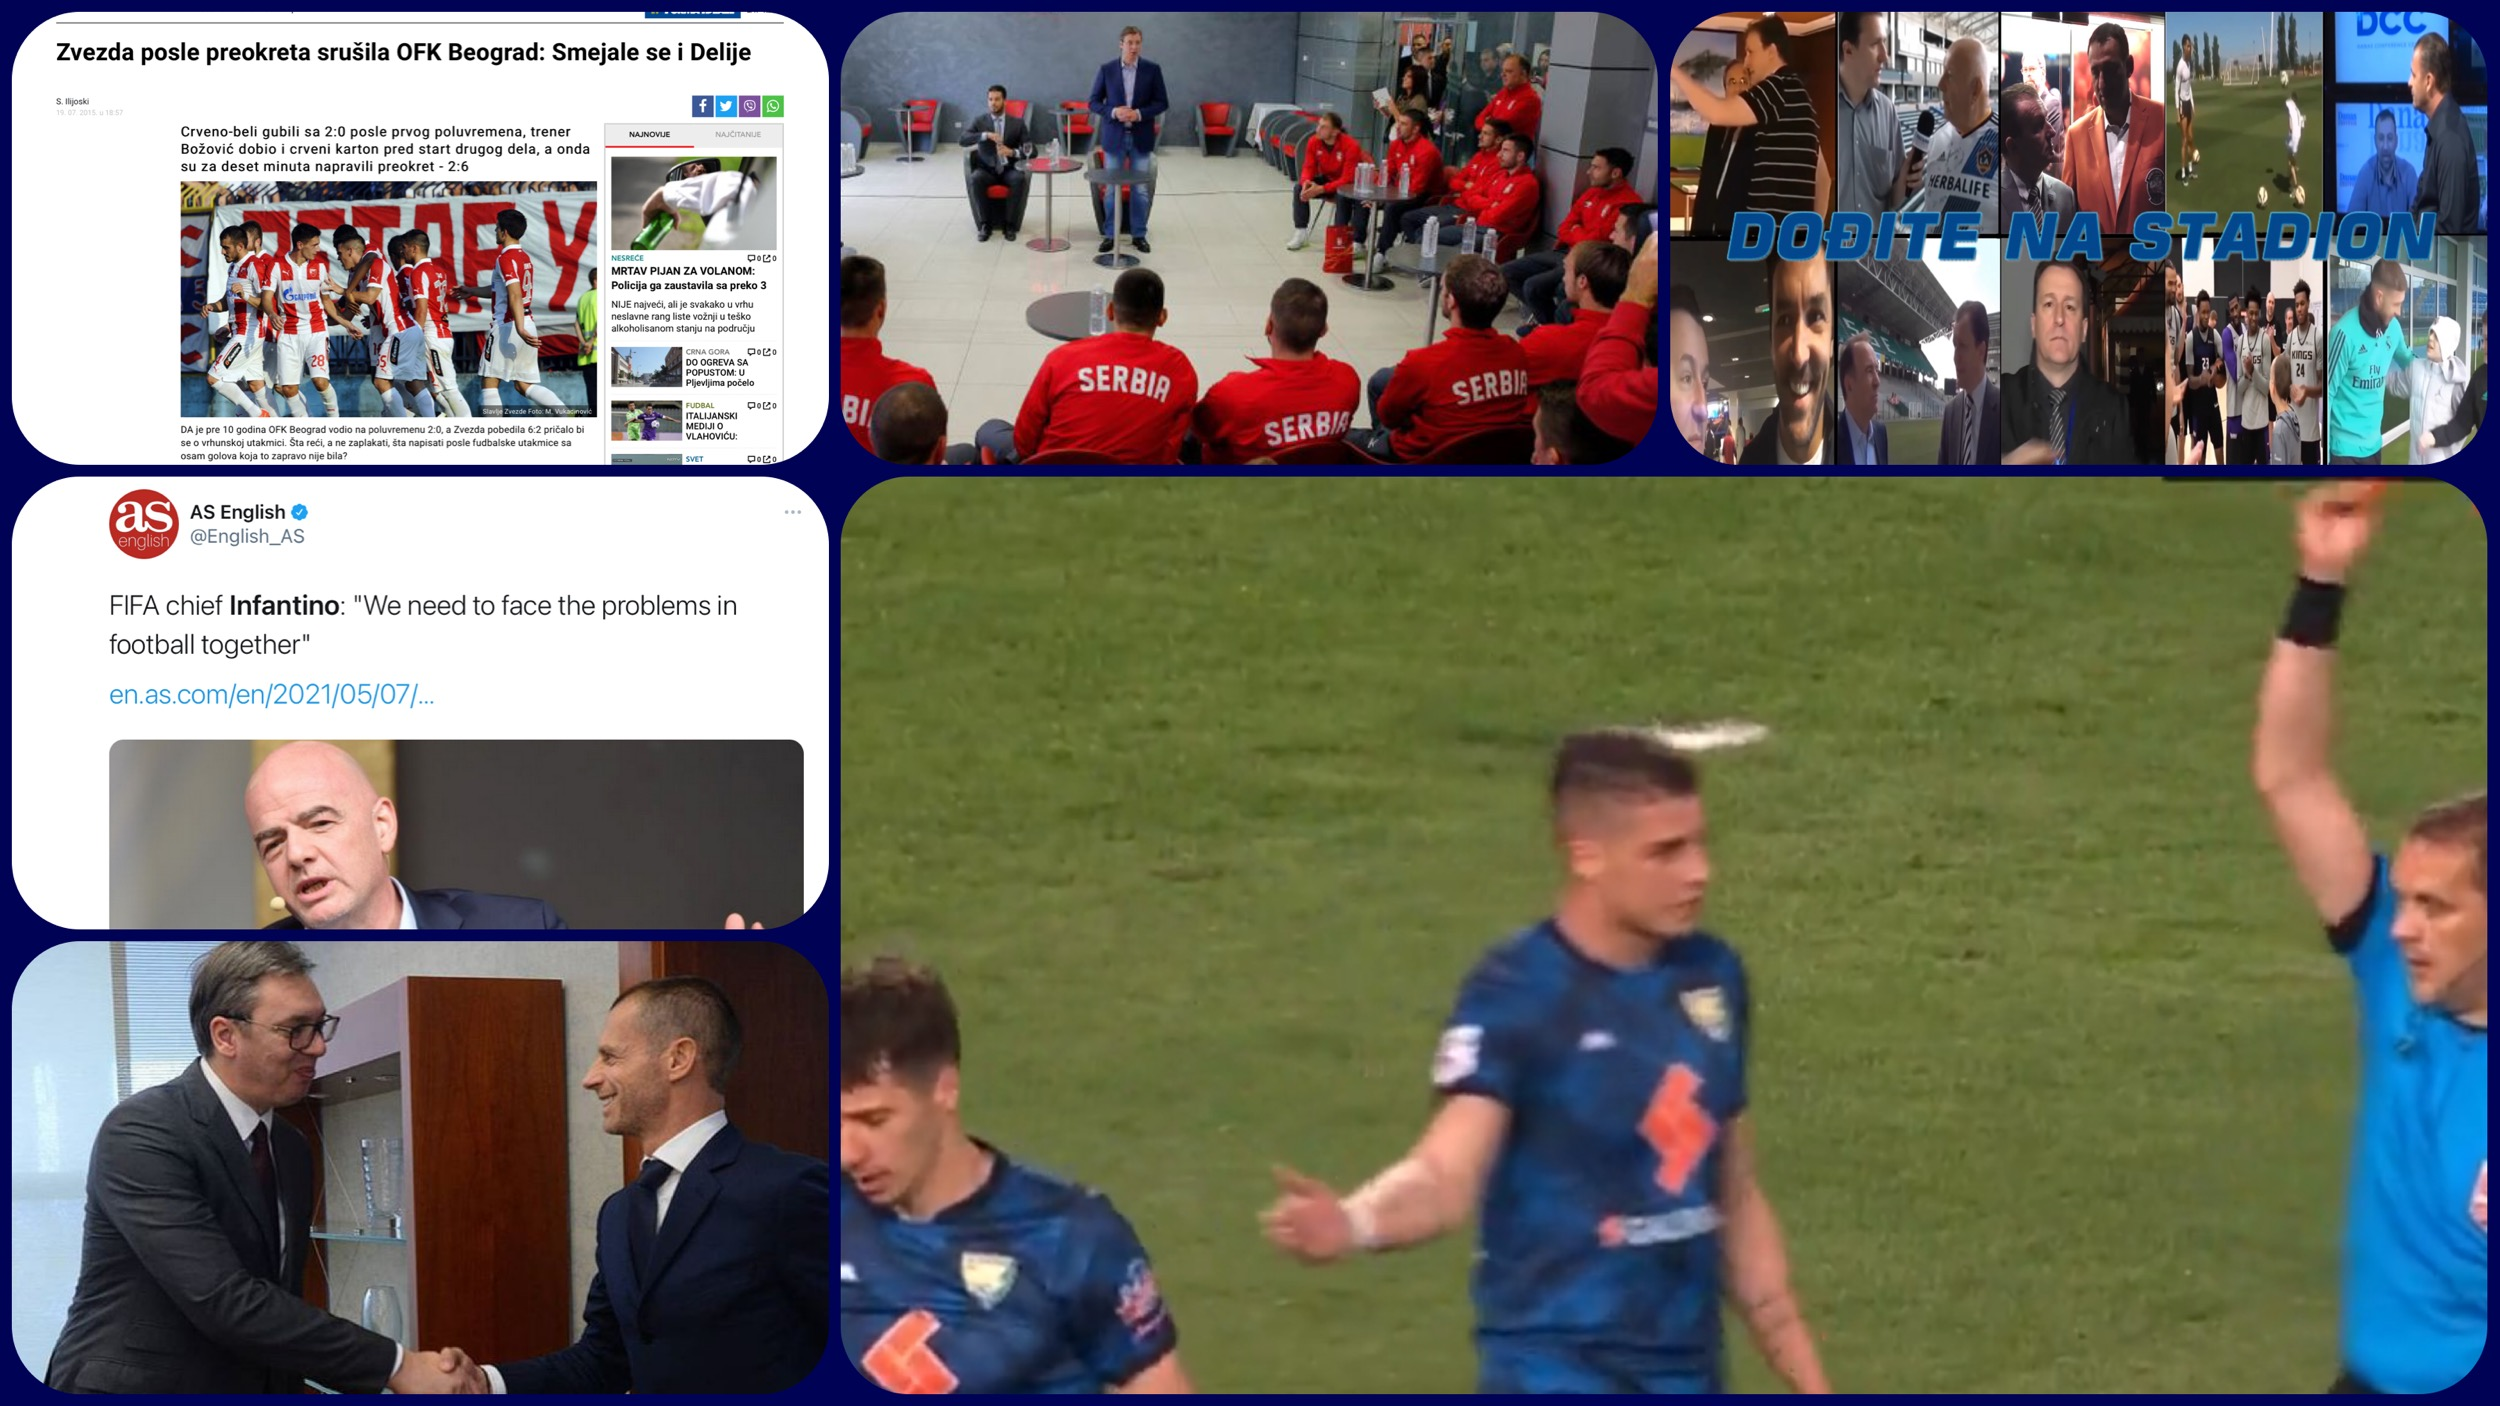 Dođite na stadion 410. Srbija centar kladioničarske mafije i FBI pred vratima UEFA (VIDEO)